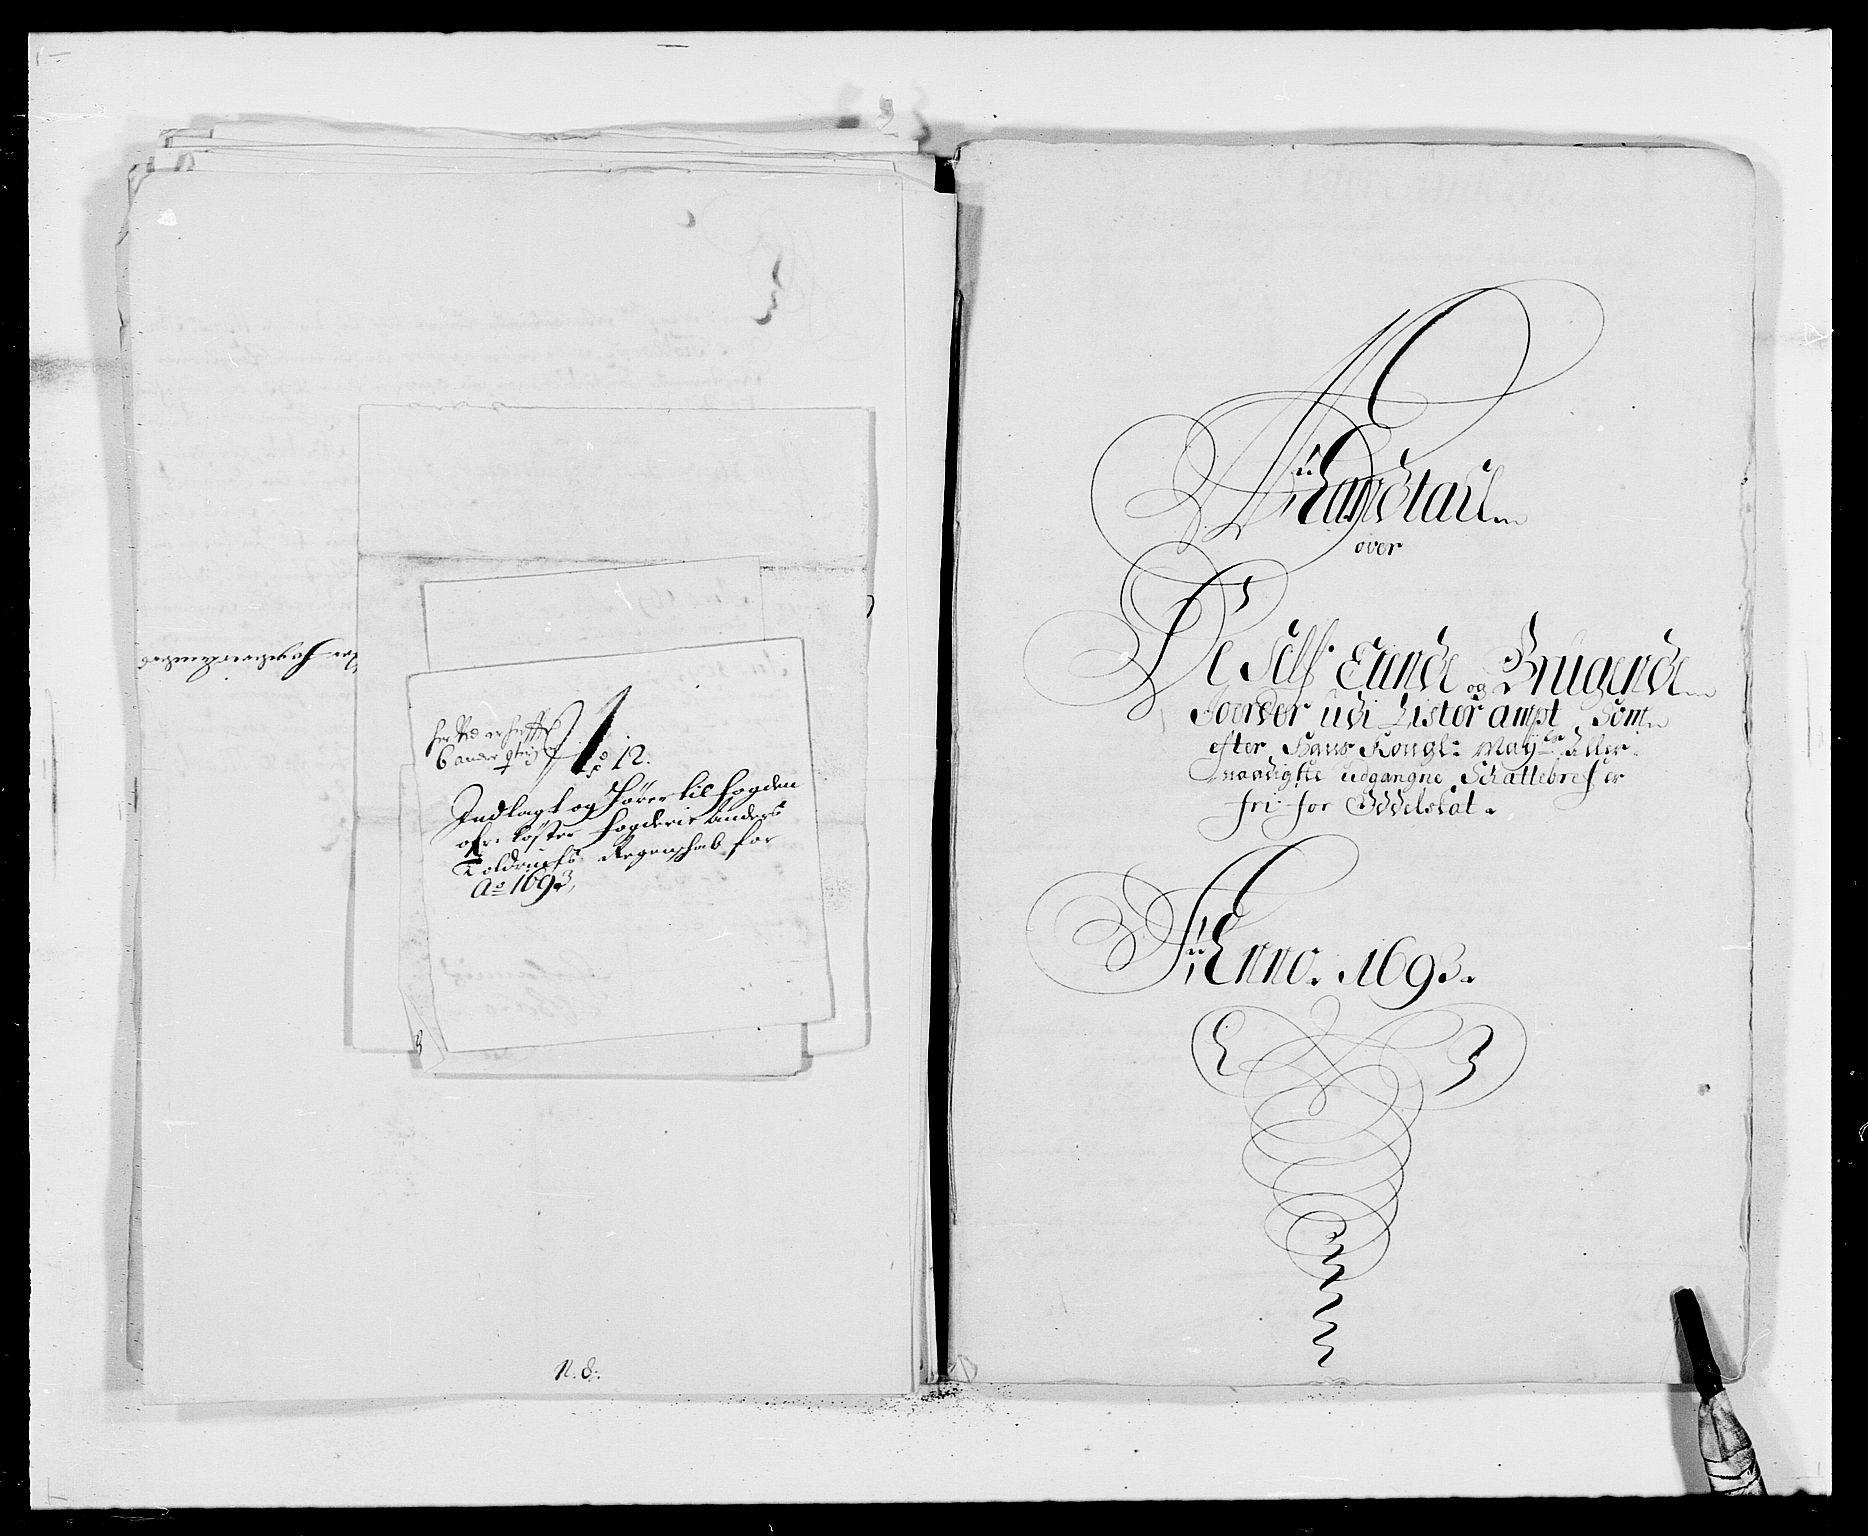 RA, Rentekammeret inntil 1814, Reviderte regnskaper, Fogderegnskap, R41/L2536: Fogderegnskap Lista, 1690-1693, s. 470